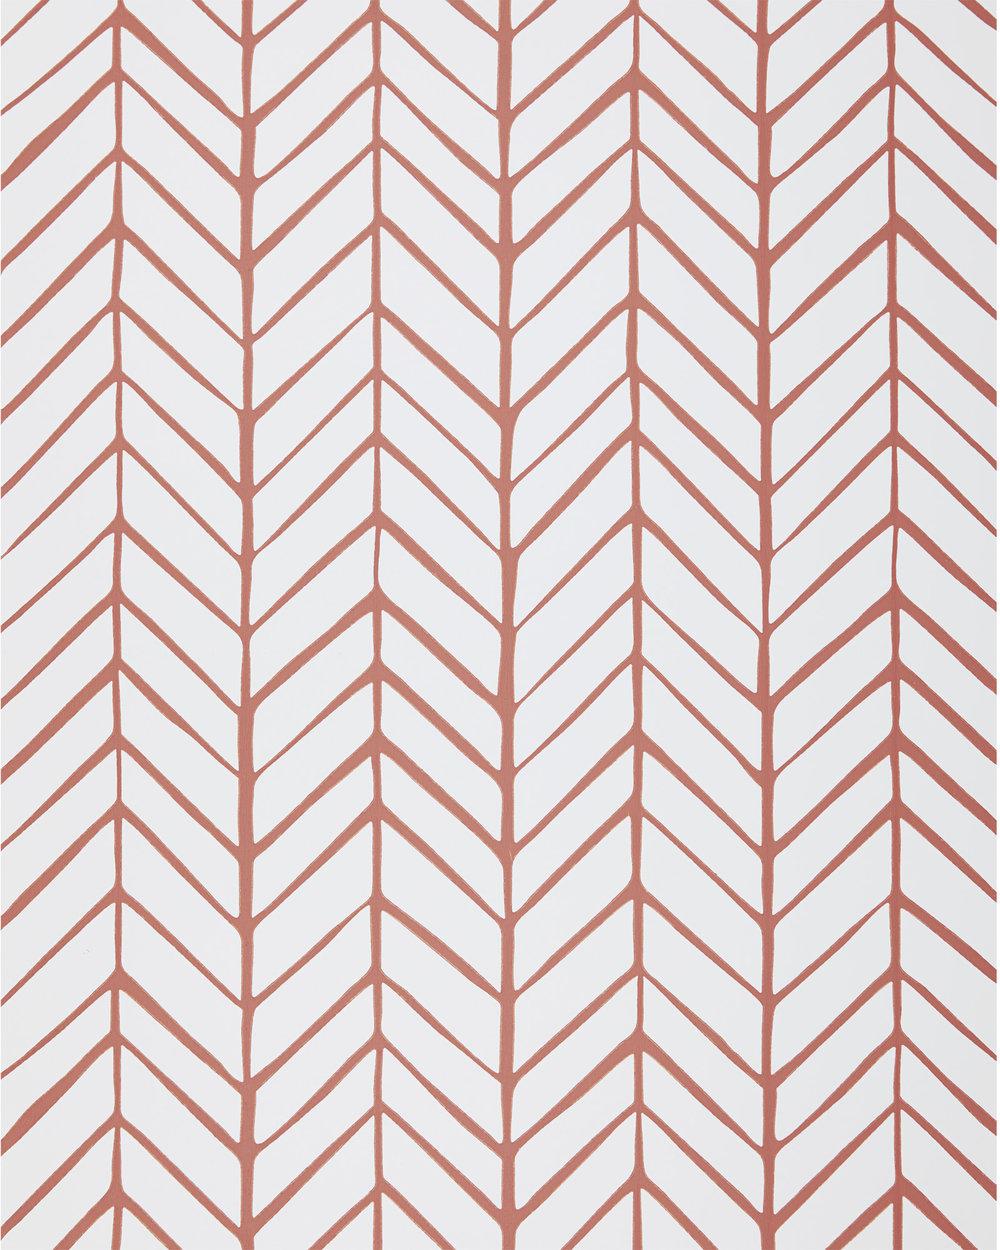 Wallpaper_Full_Feather_Coral_MV_Crop_BASE.jpg